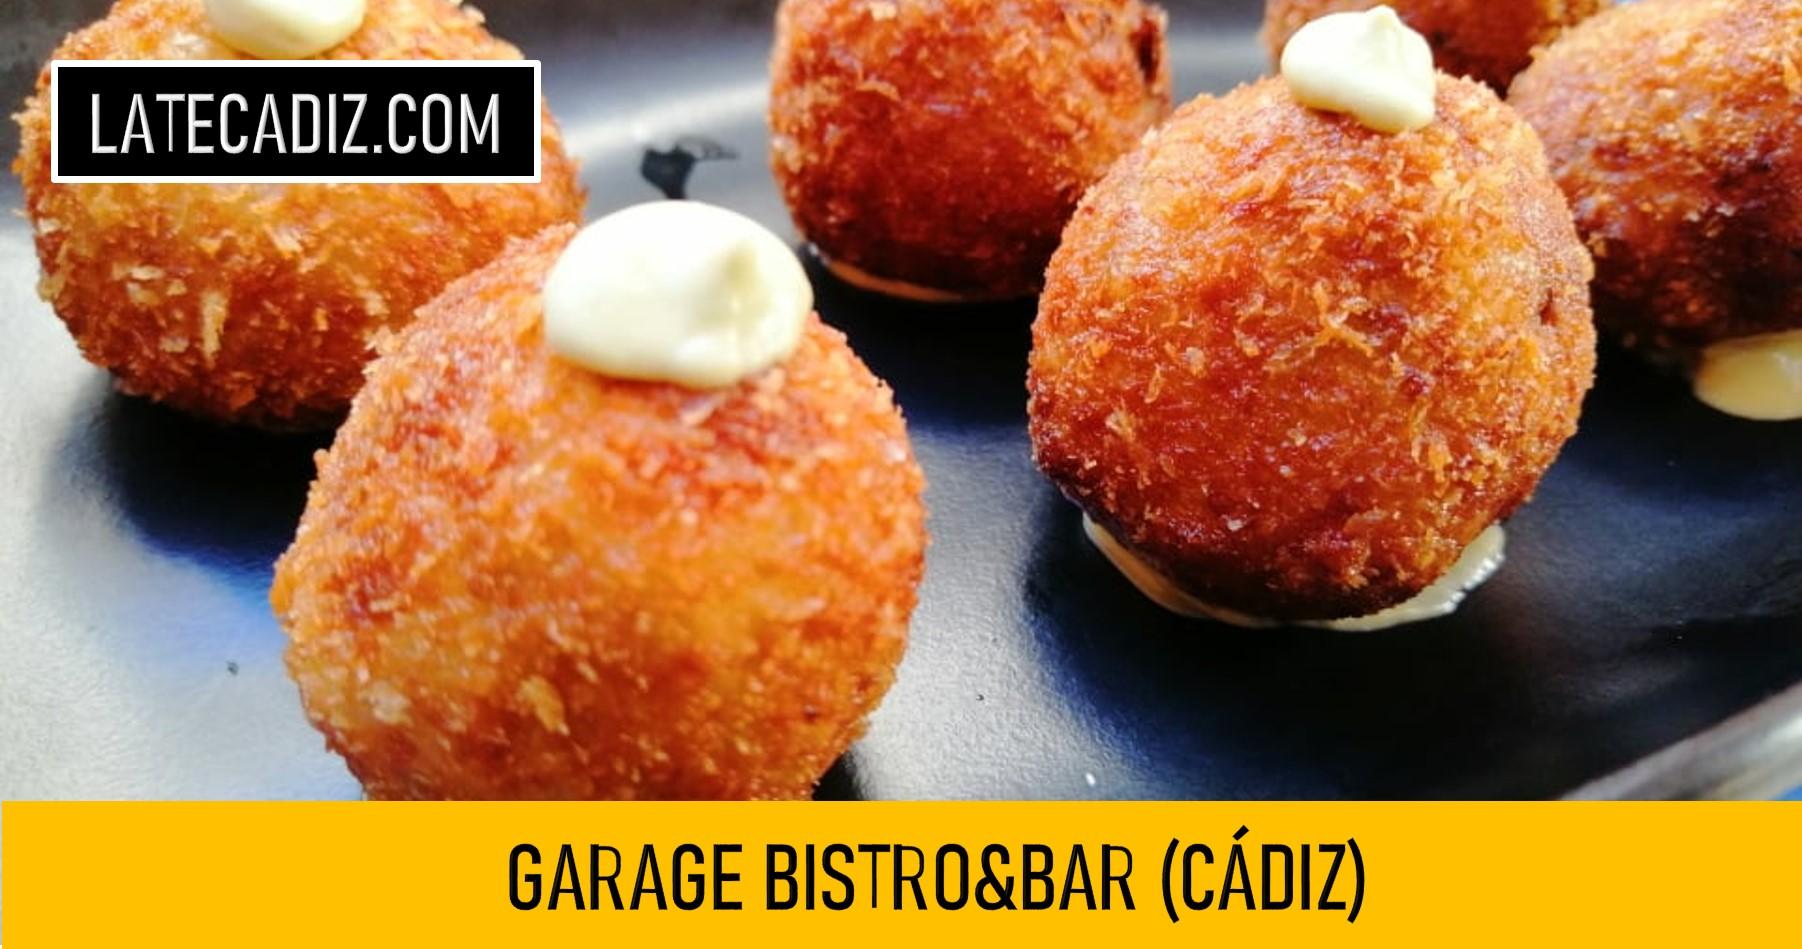 Garage bistro&bar cádiz 0